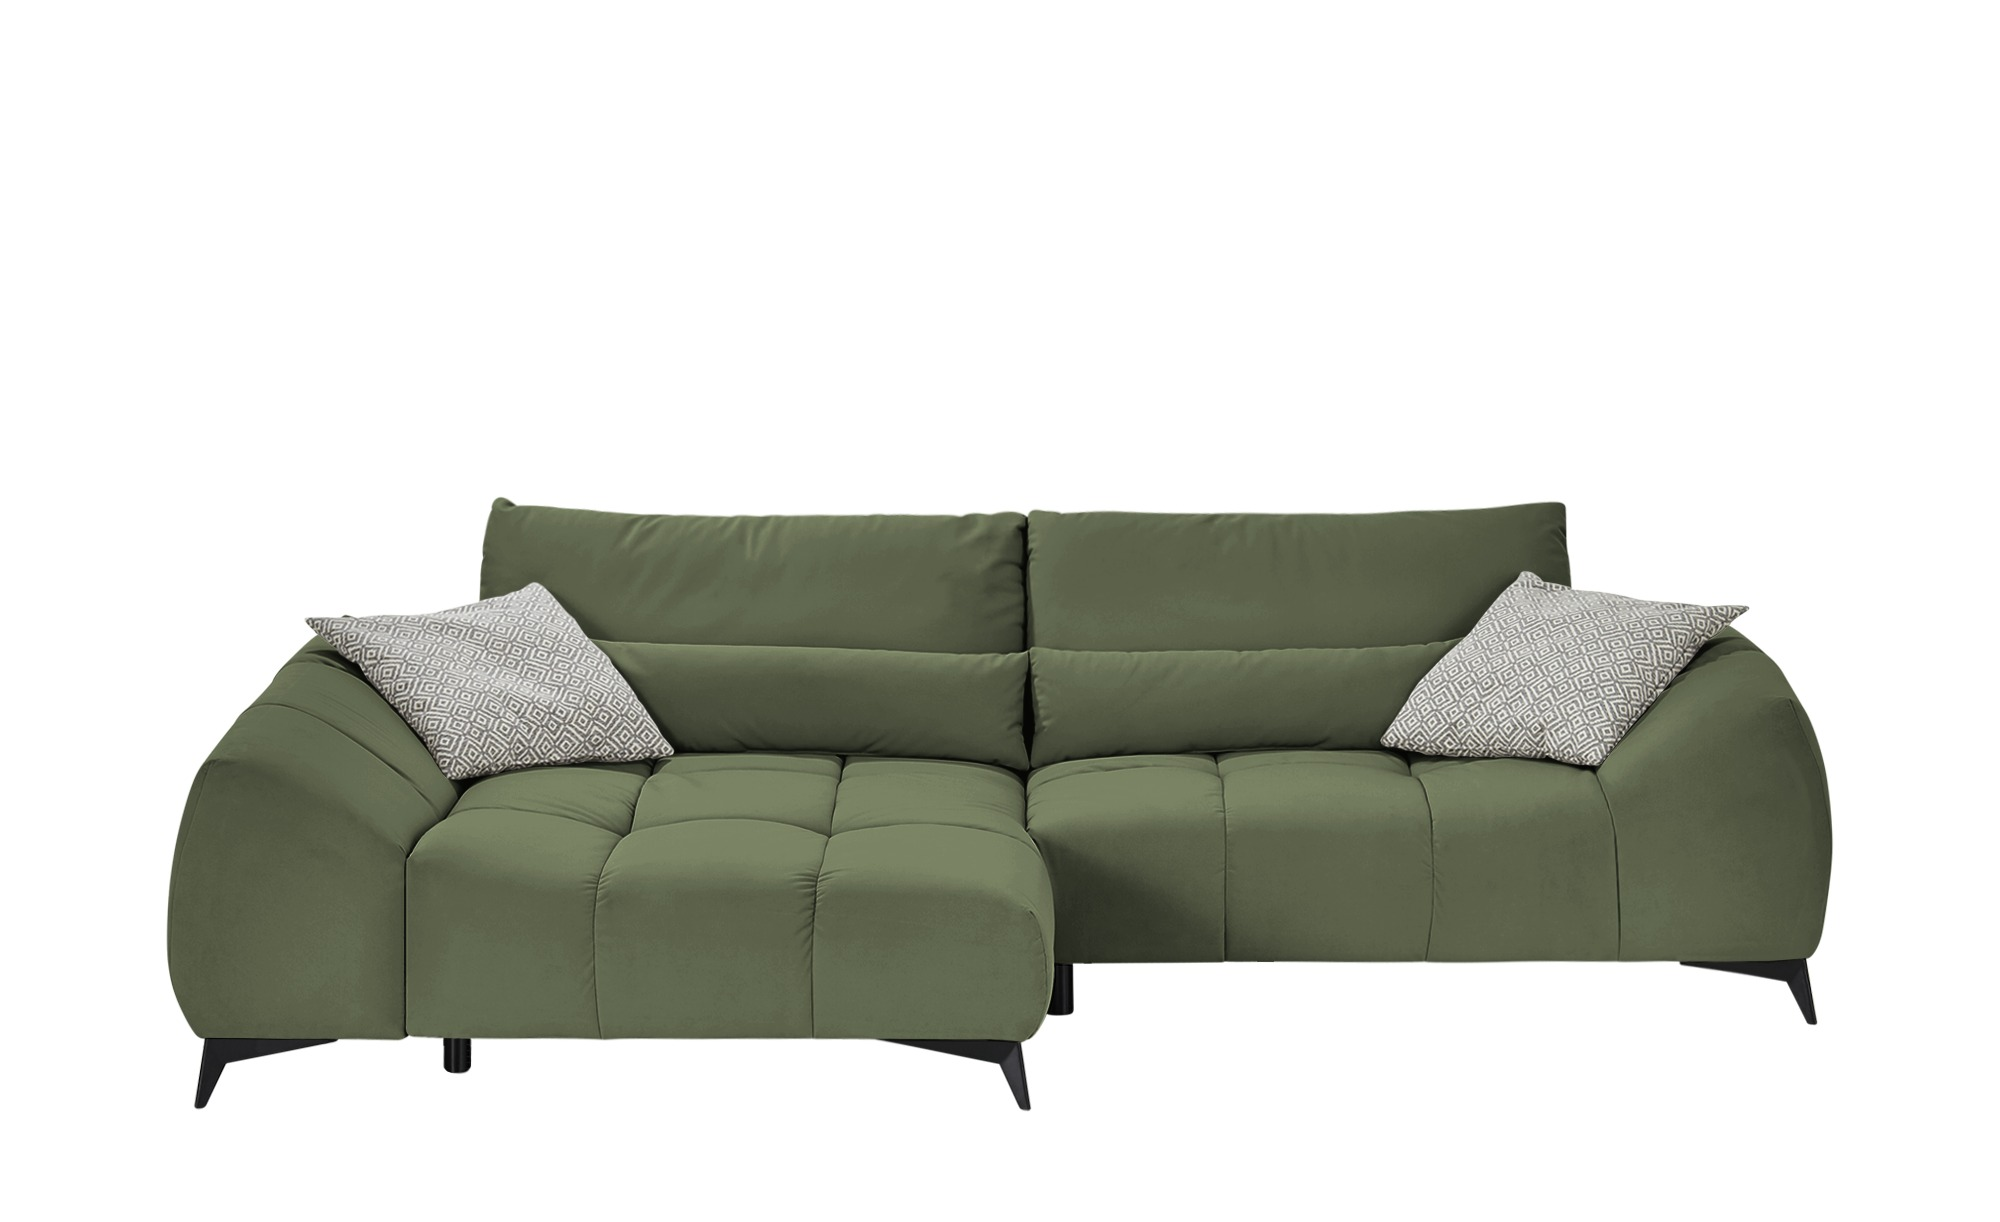 bobb Ecksofa  Dalia ¦ grün ¦ Maße (cm): H: 91 Polstermöbel > Sofas > Ecksofas - Höffner